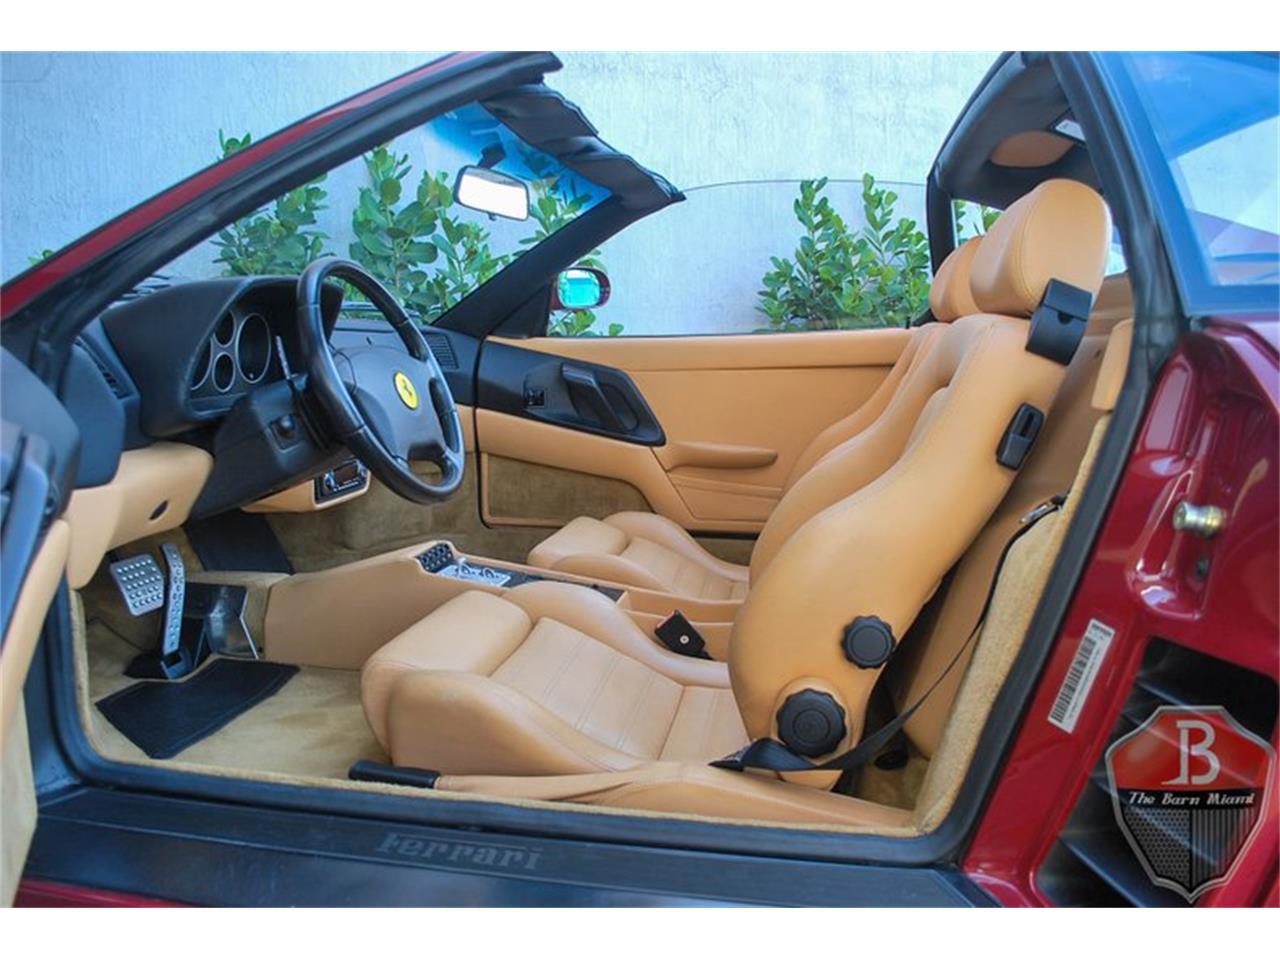 Large Picture of 1999 Ferrari F355 located in Miami Florida - $89,900.00 - N6Y8